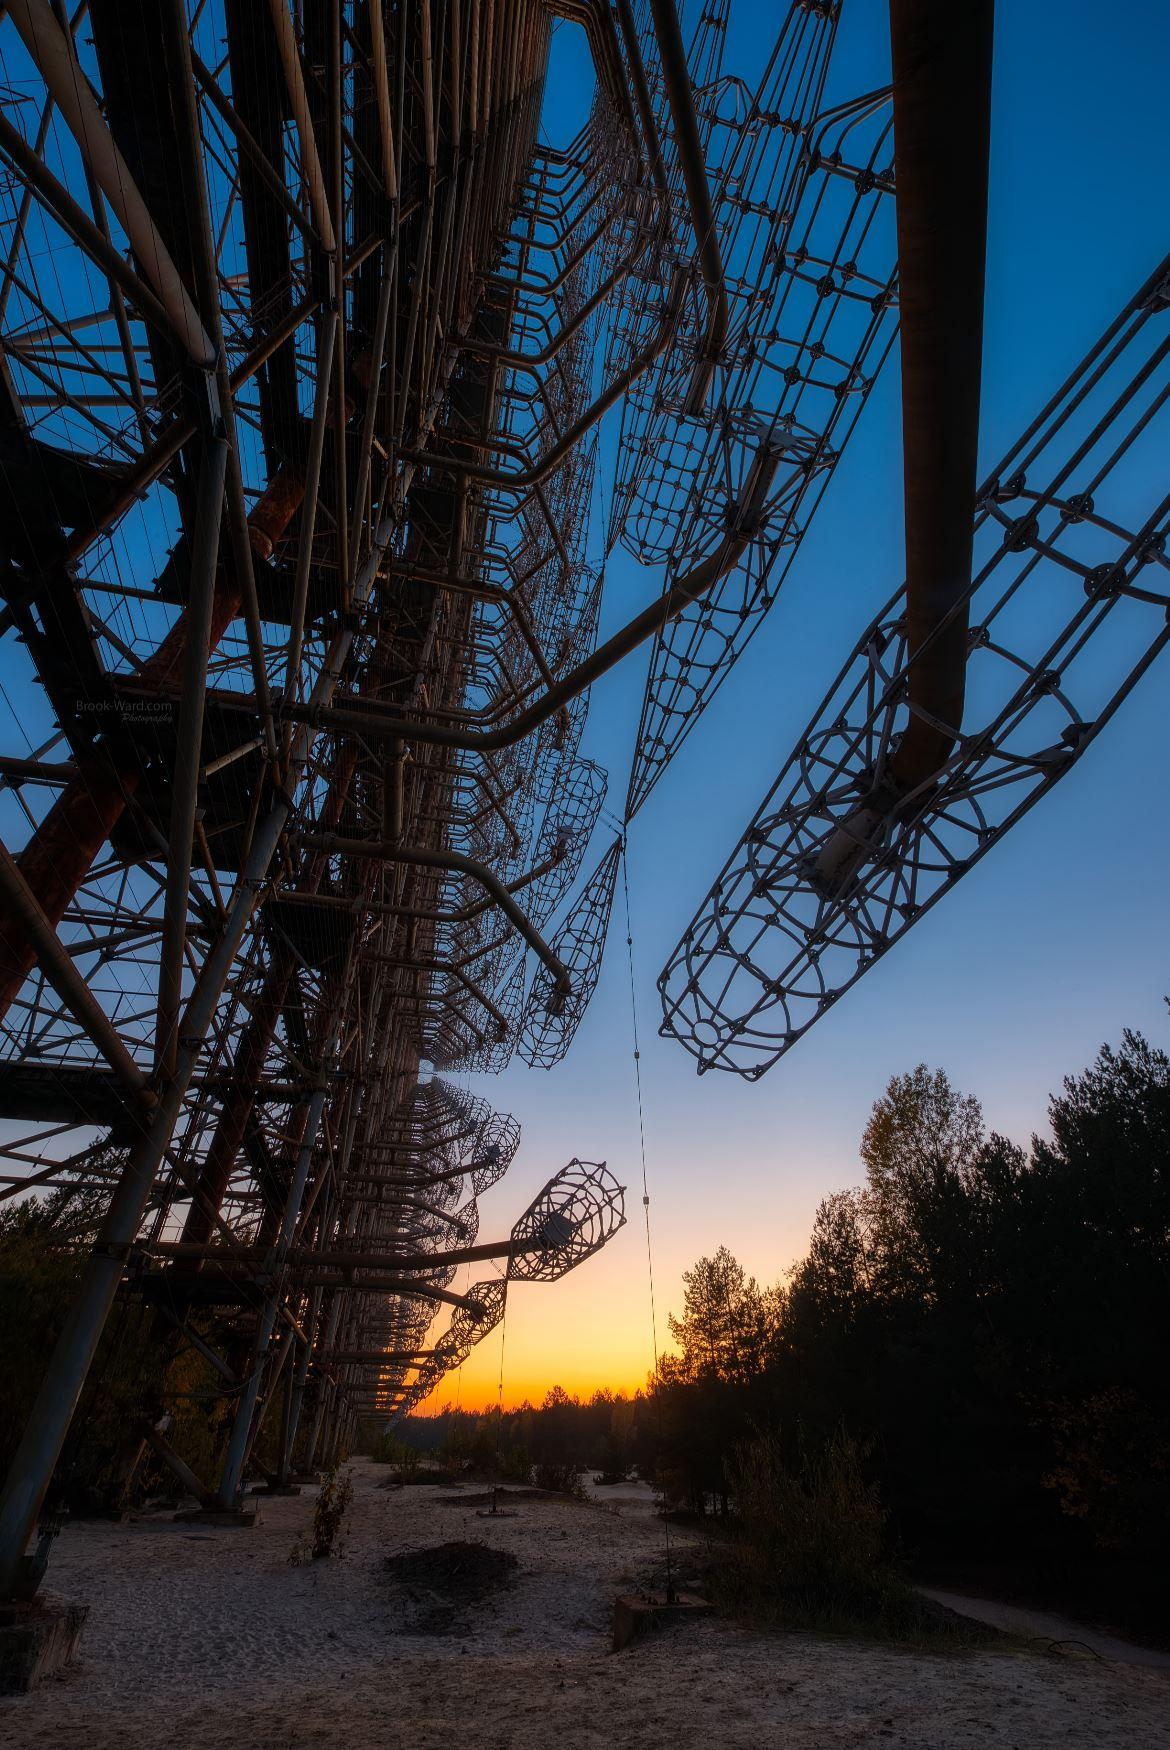 Chernobyl - DUGA Russian Woodpecker